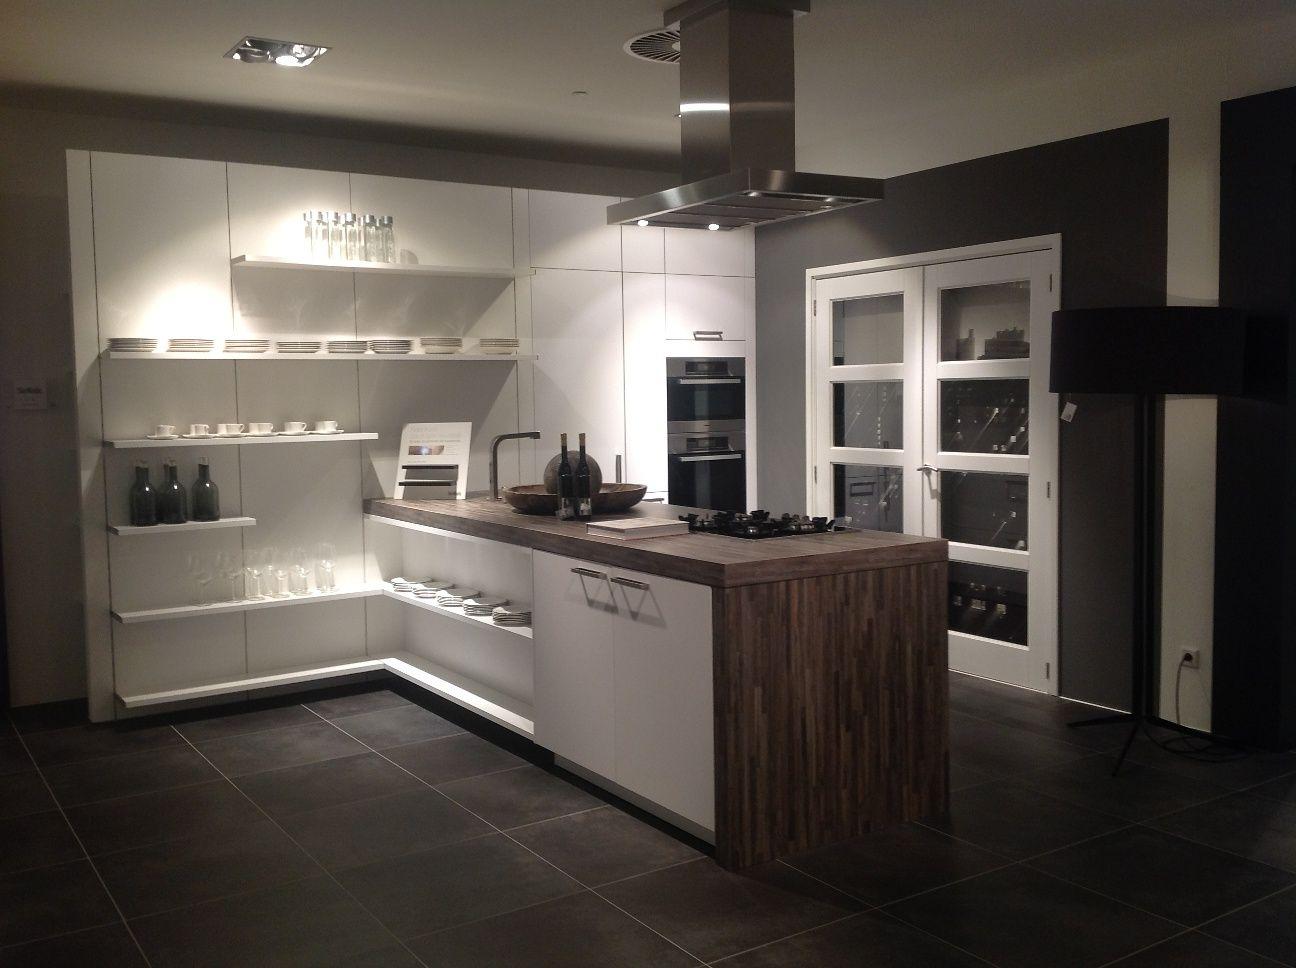 siematic showroomkeukens siematic showroomkeuken aanbiedingen siematic hightech. Black Bedroom Furniture Sets. Home Design Ideas